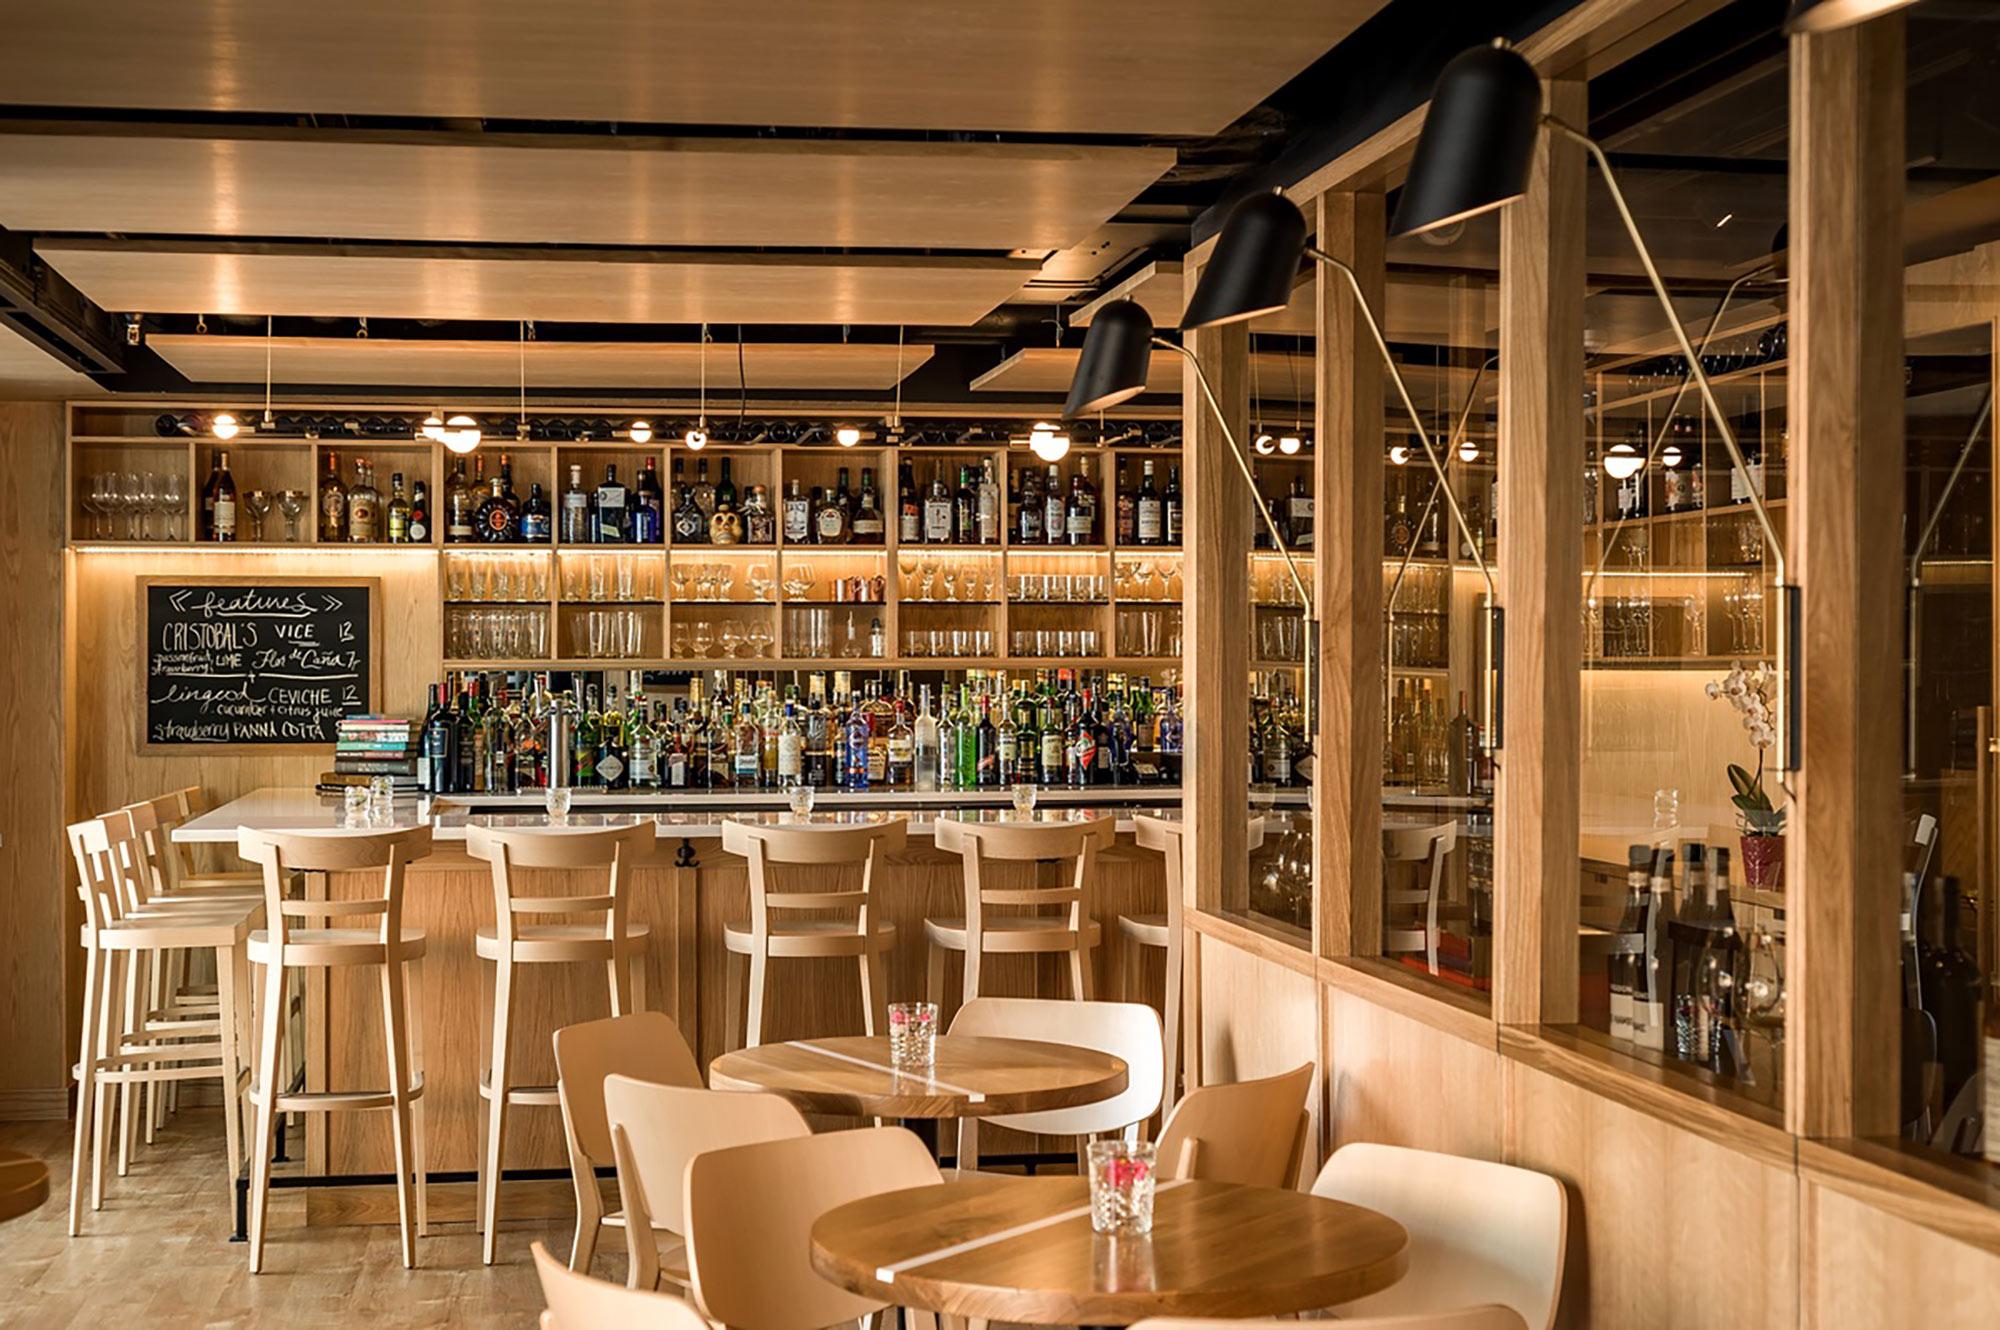 interior-design-halifax-restaurant-bar-seating.jpg